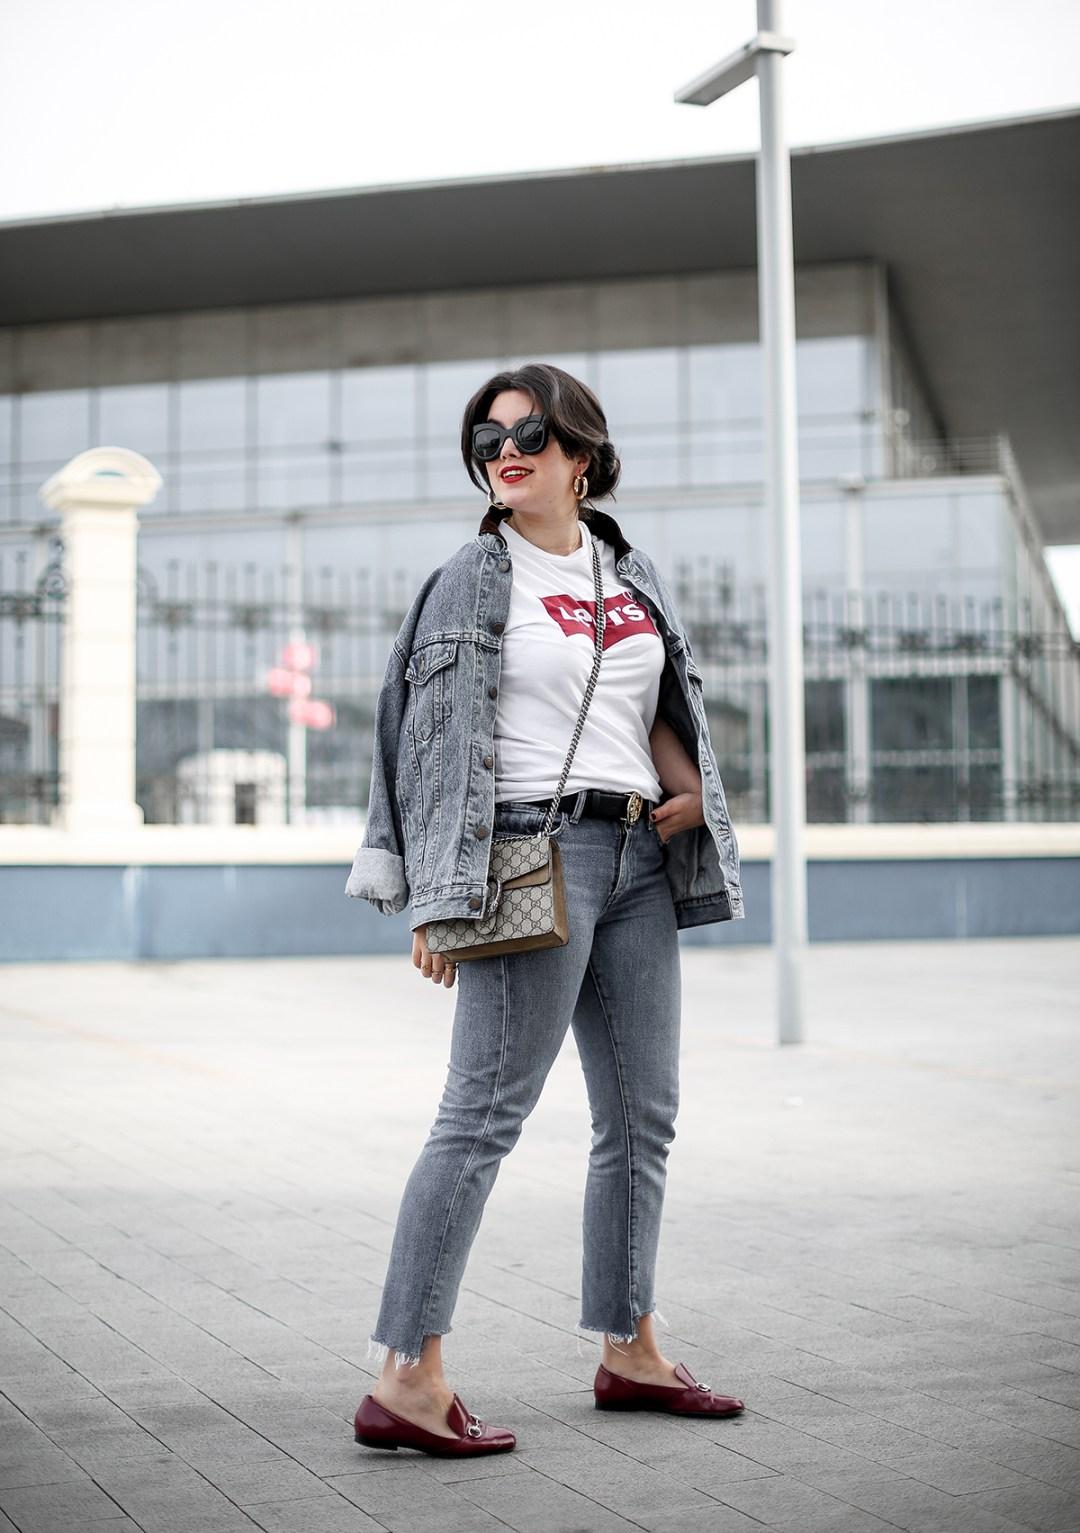 denim-total-look-levis-girl-vintage-gucci-horsebit-shoes-dionysus-bag6